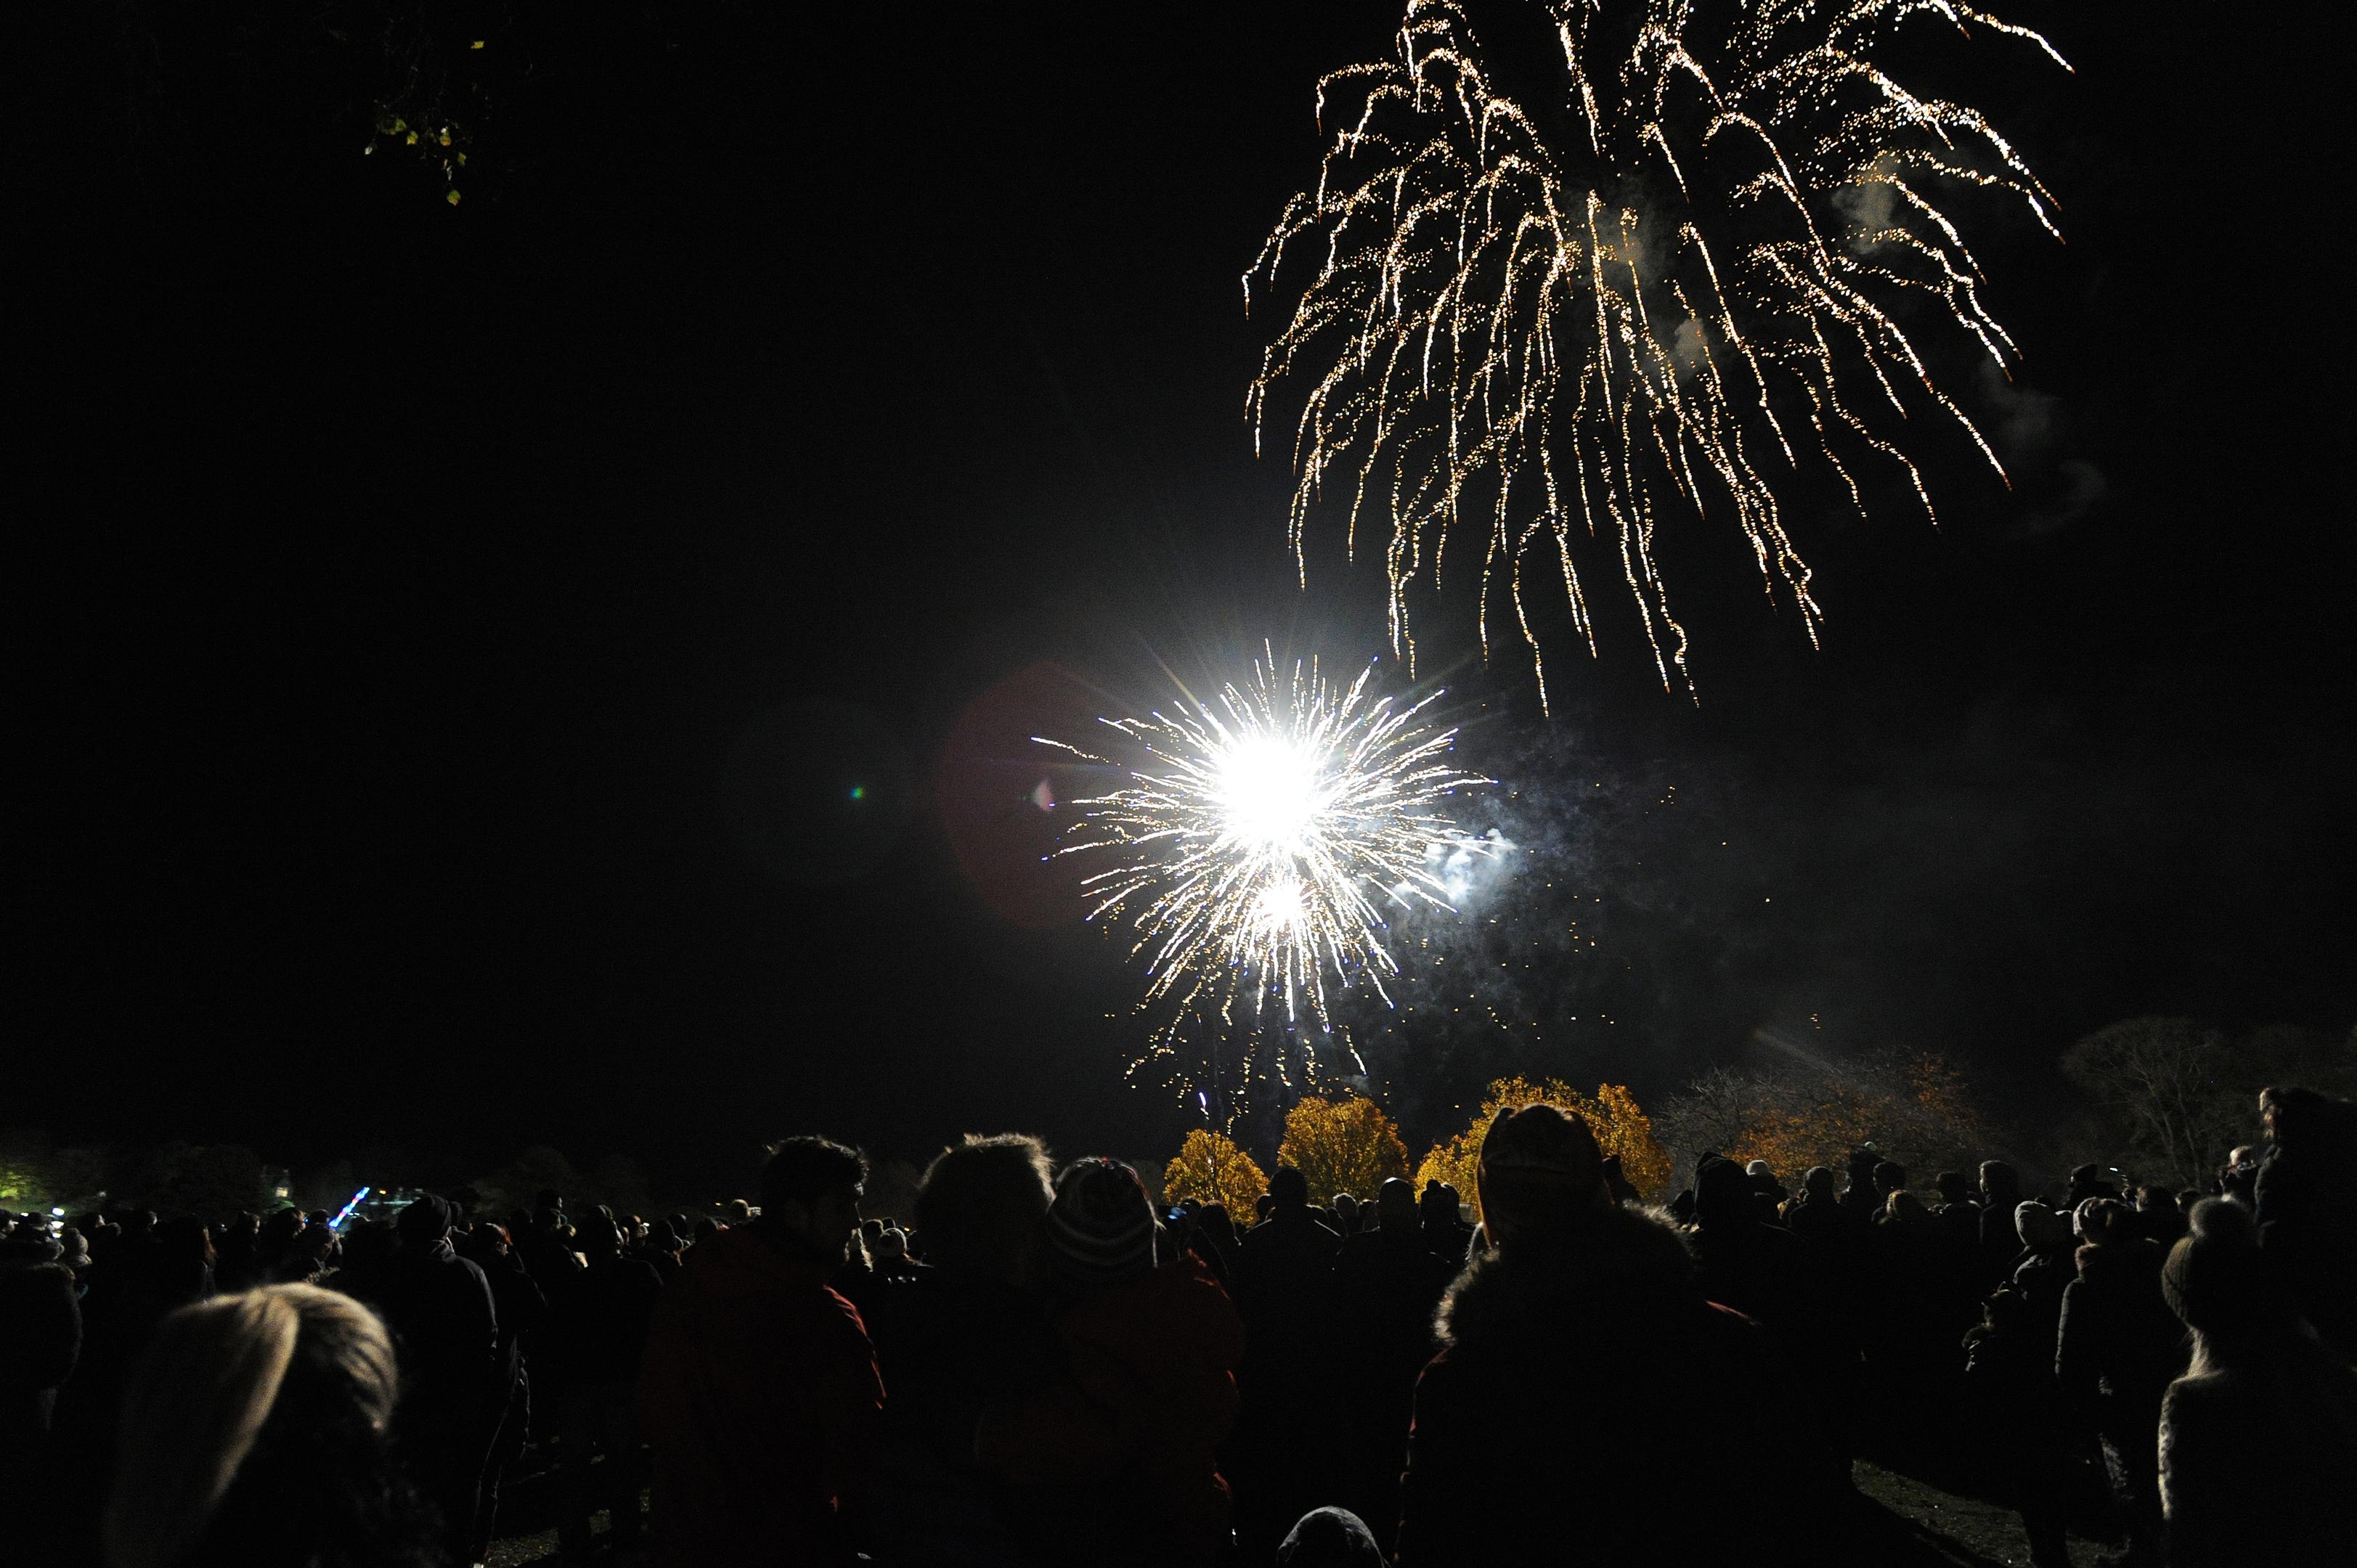 The fireworks display at Baxter Park.